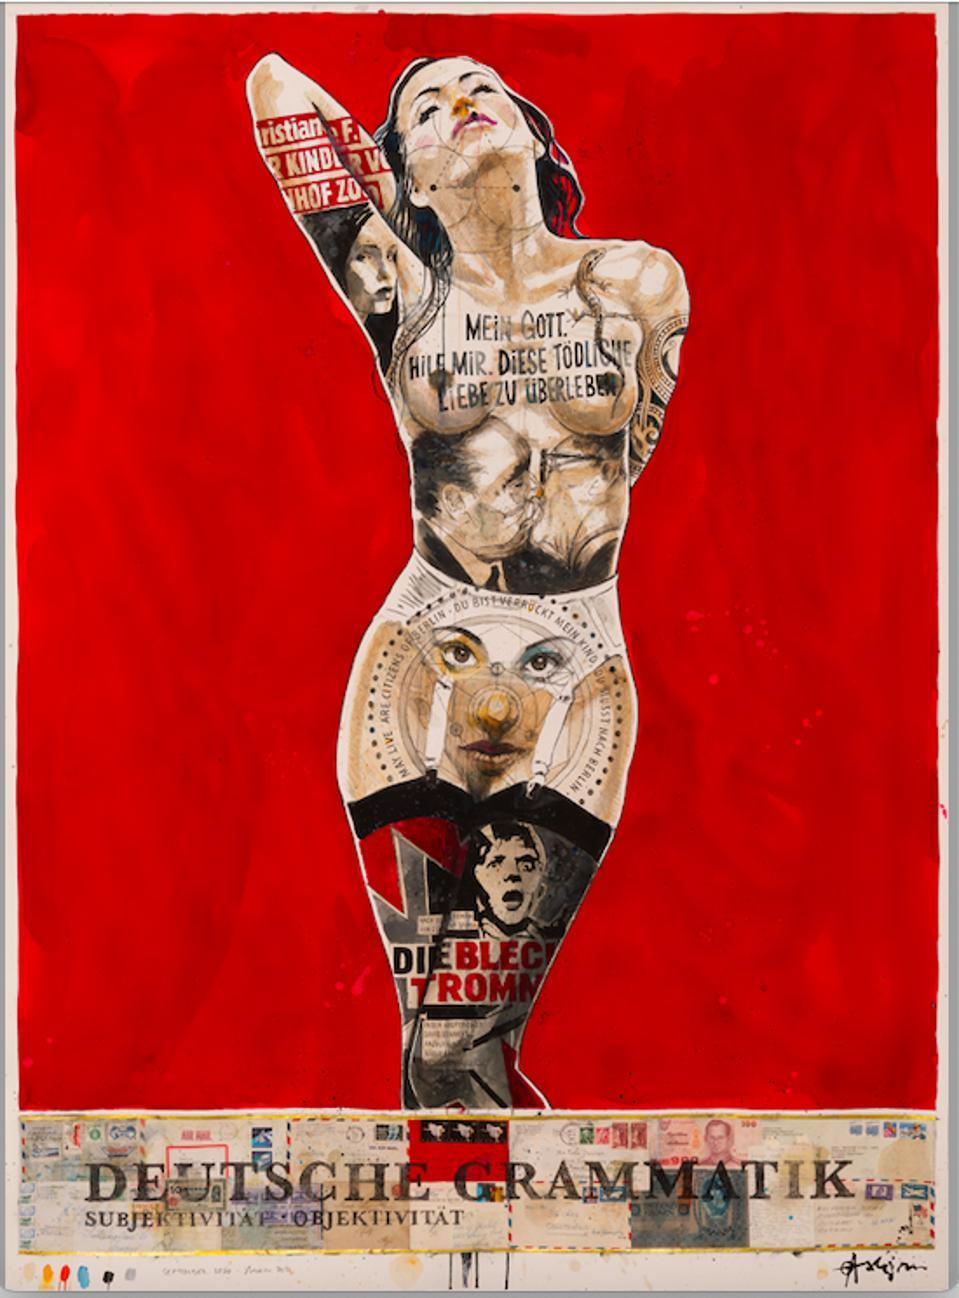 Full-body portrait of woman wearing white garter belt and sheer black thigh-high stockings